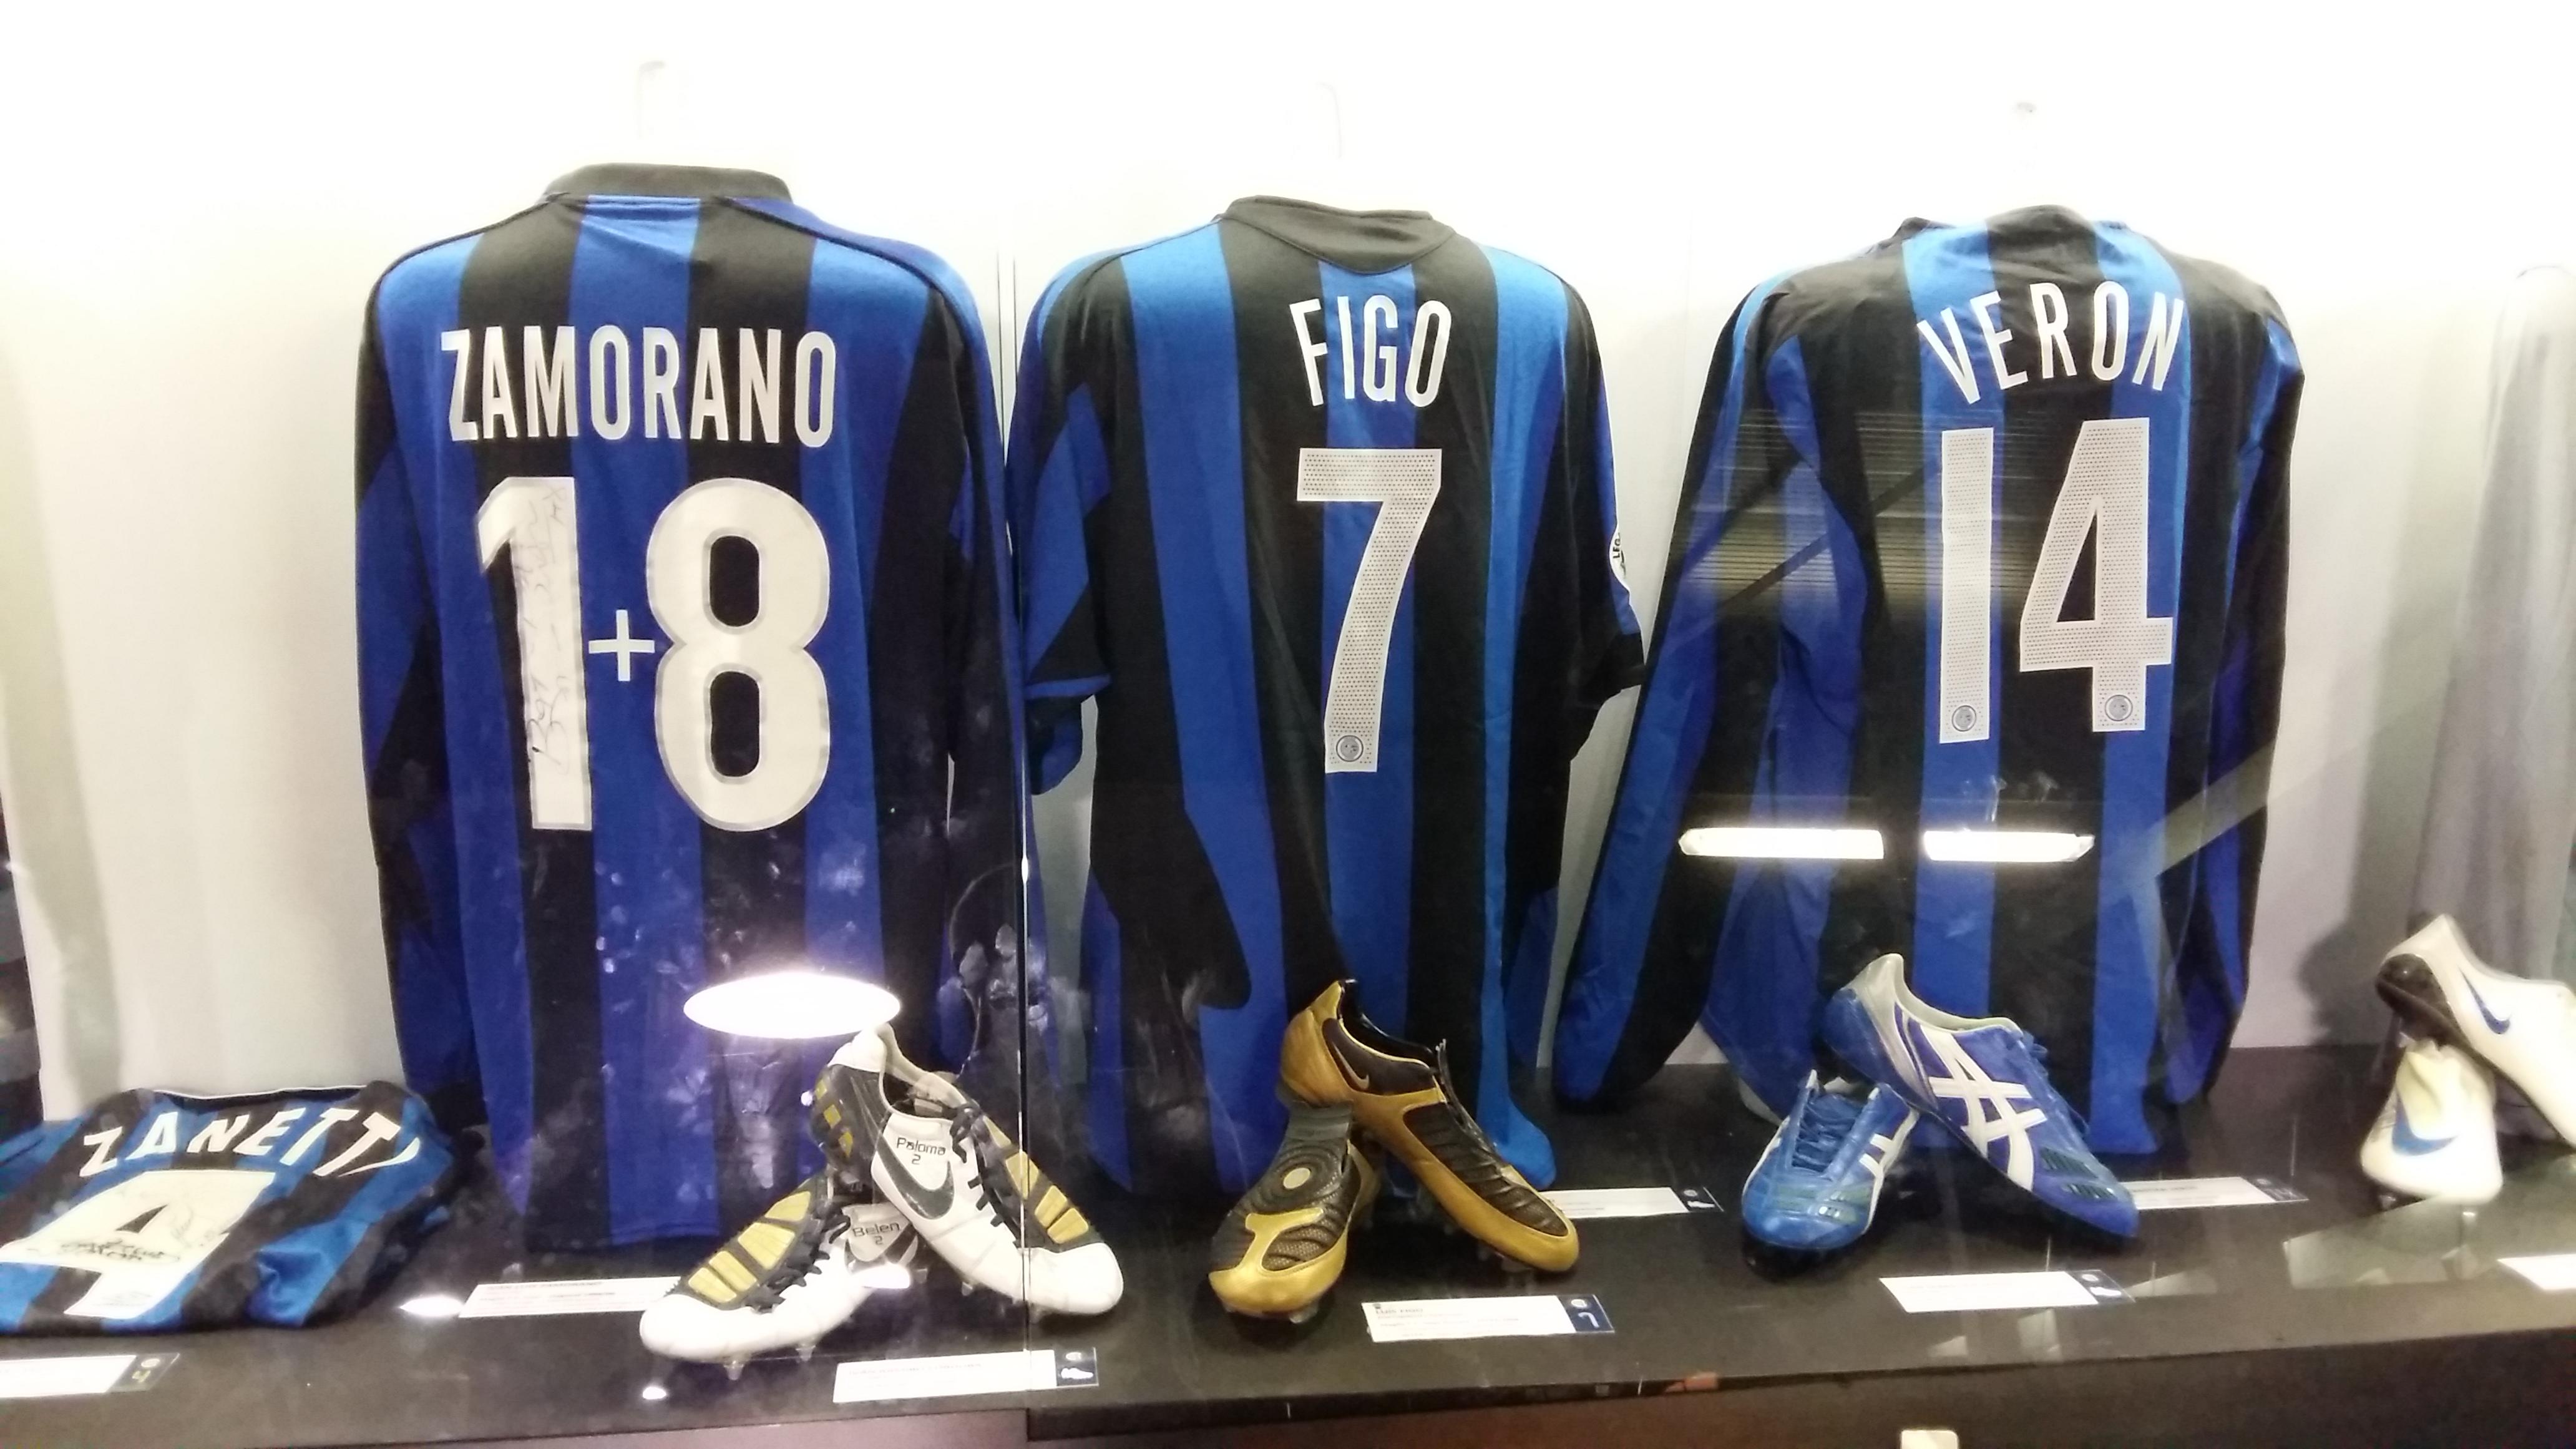 Jerseys_of_Zanetti%2C_Zamorano%2C_Figo_%